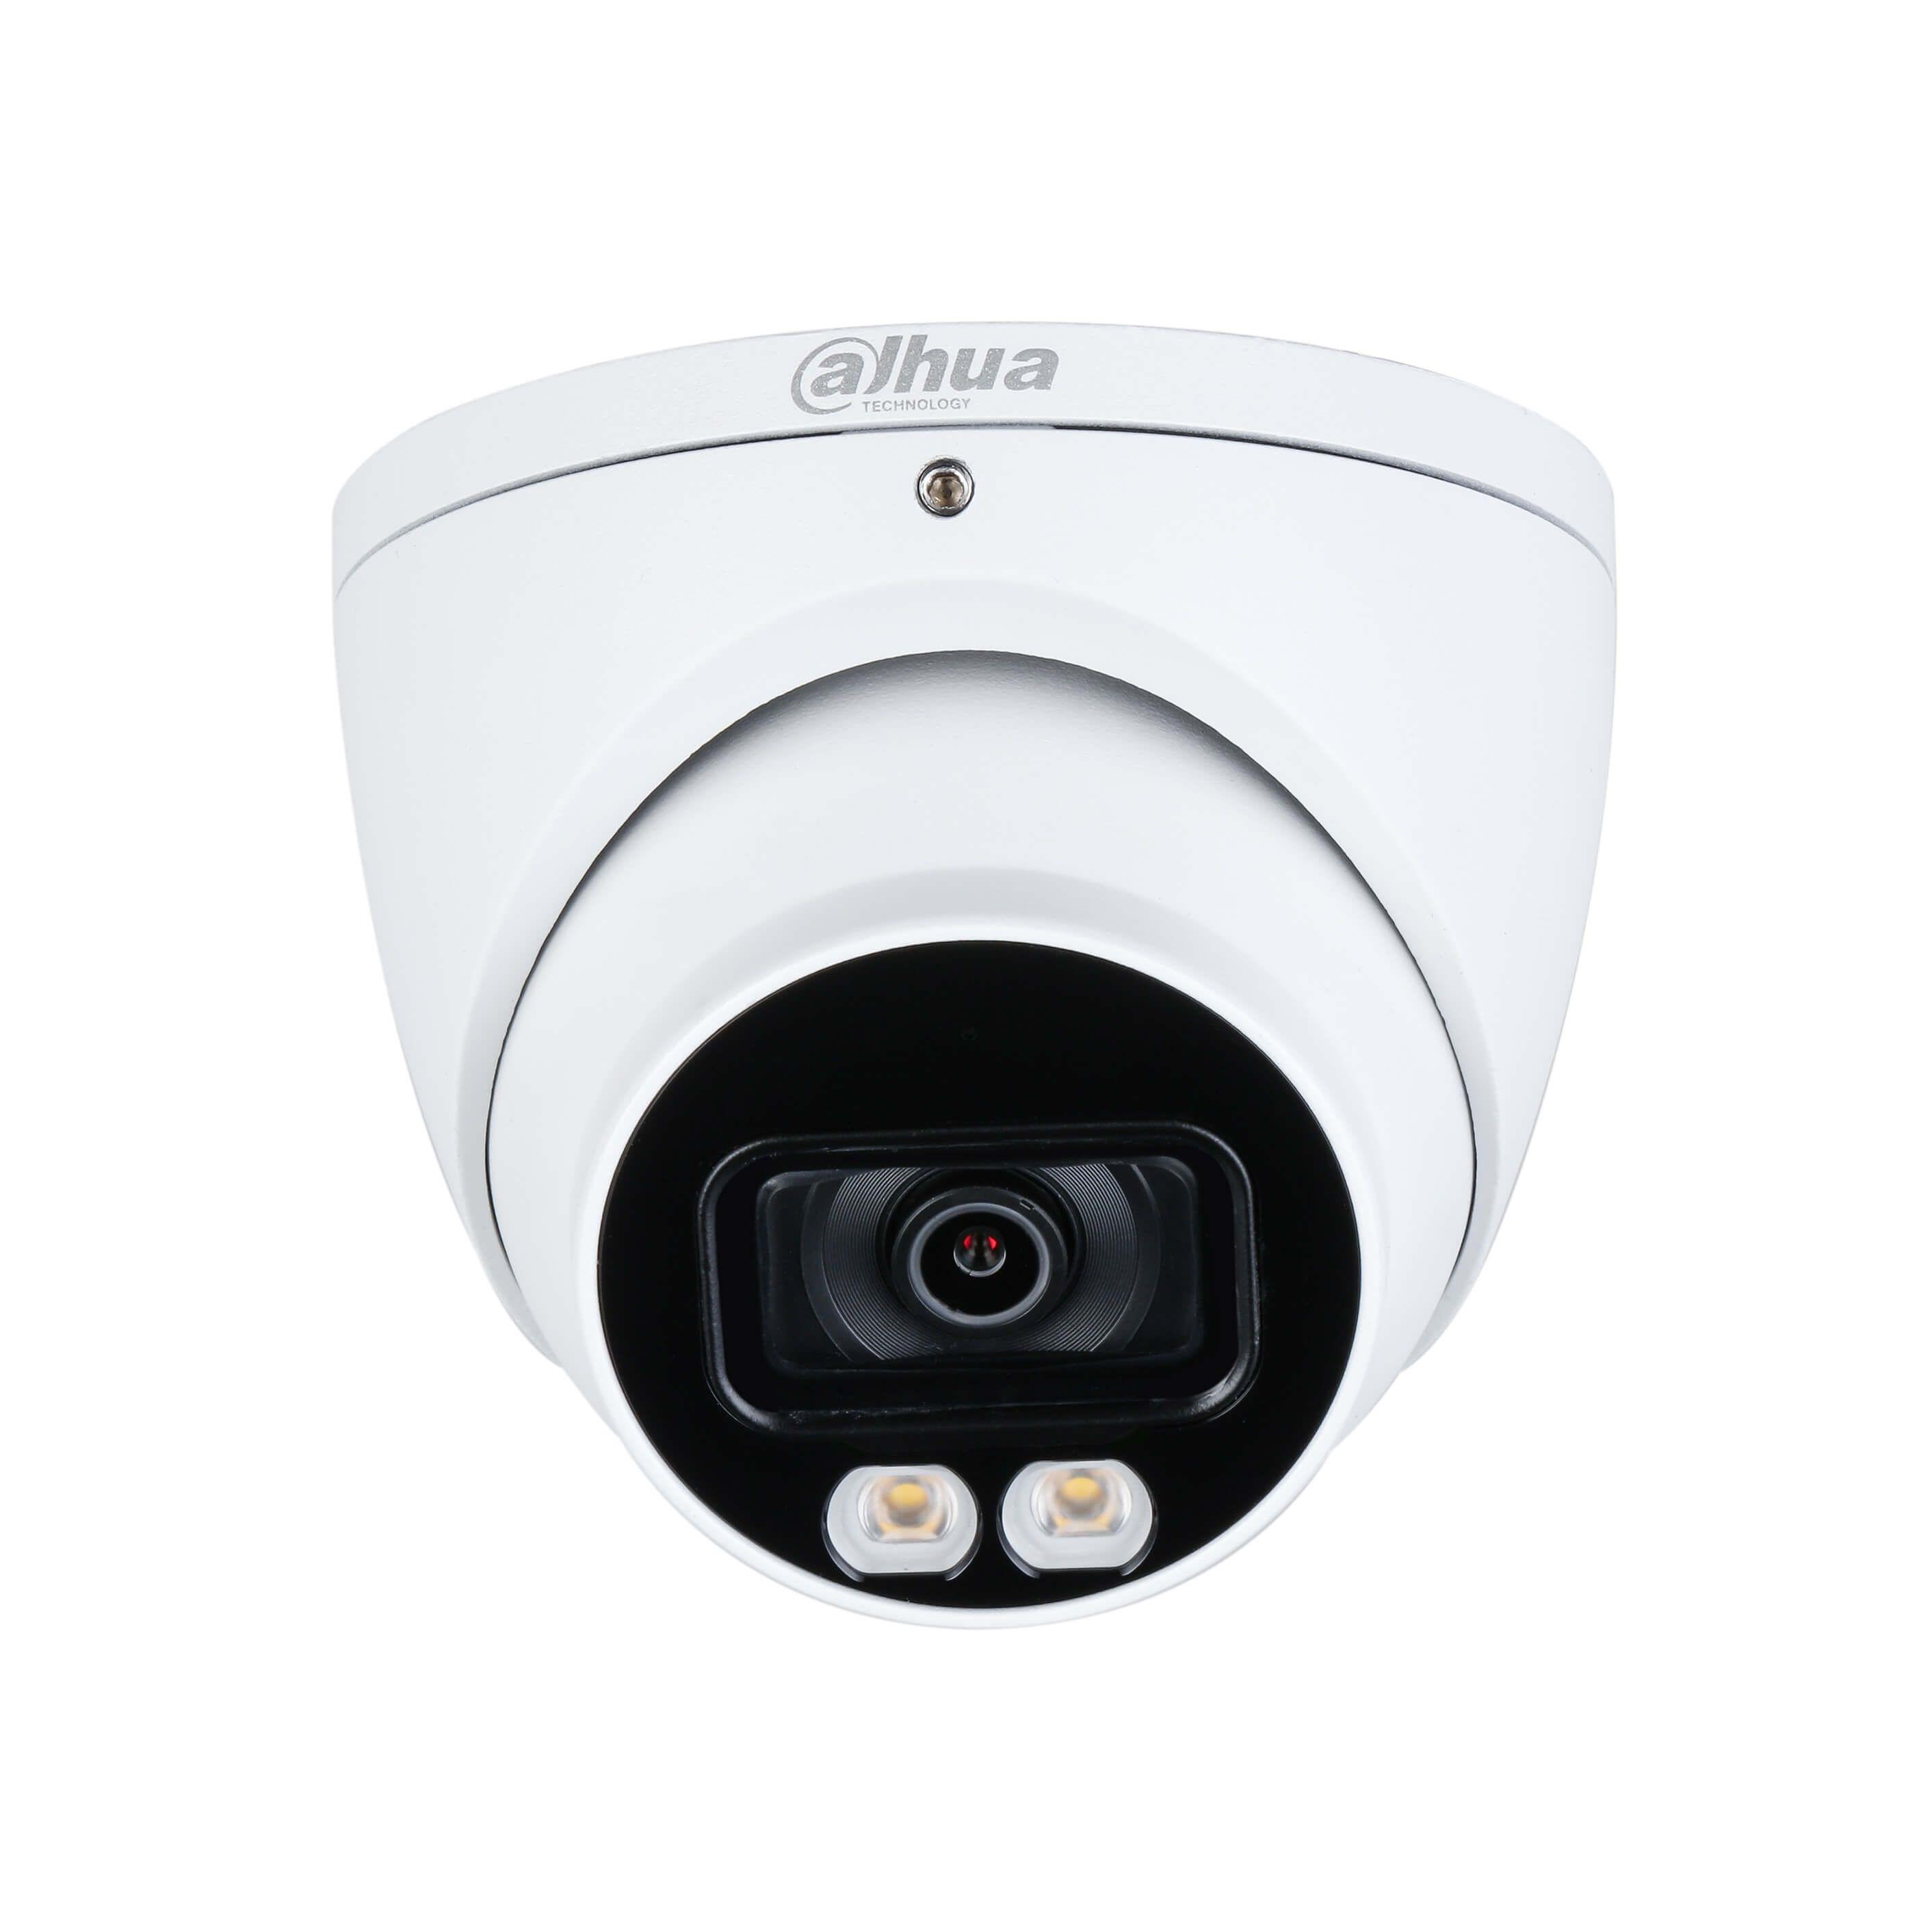 Camera Dahua DH-HAC-HDW1239TP-A-LED